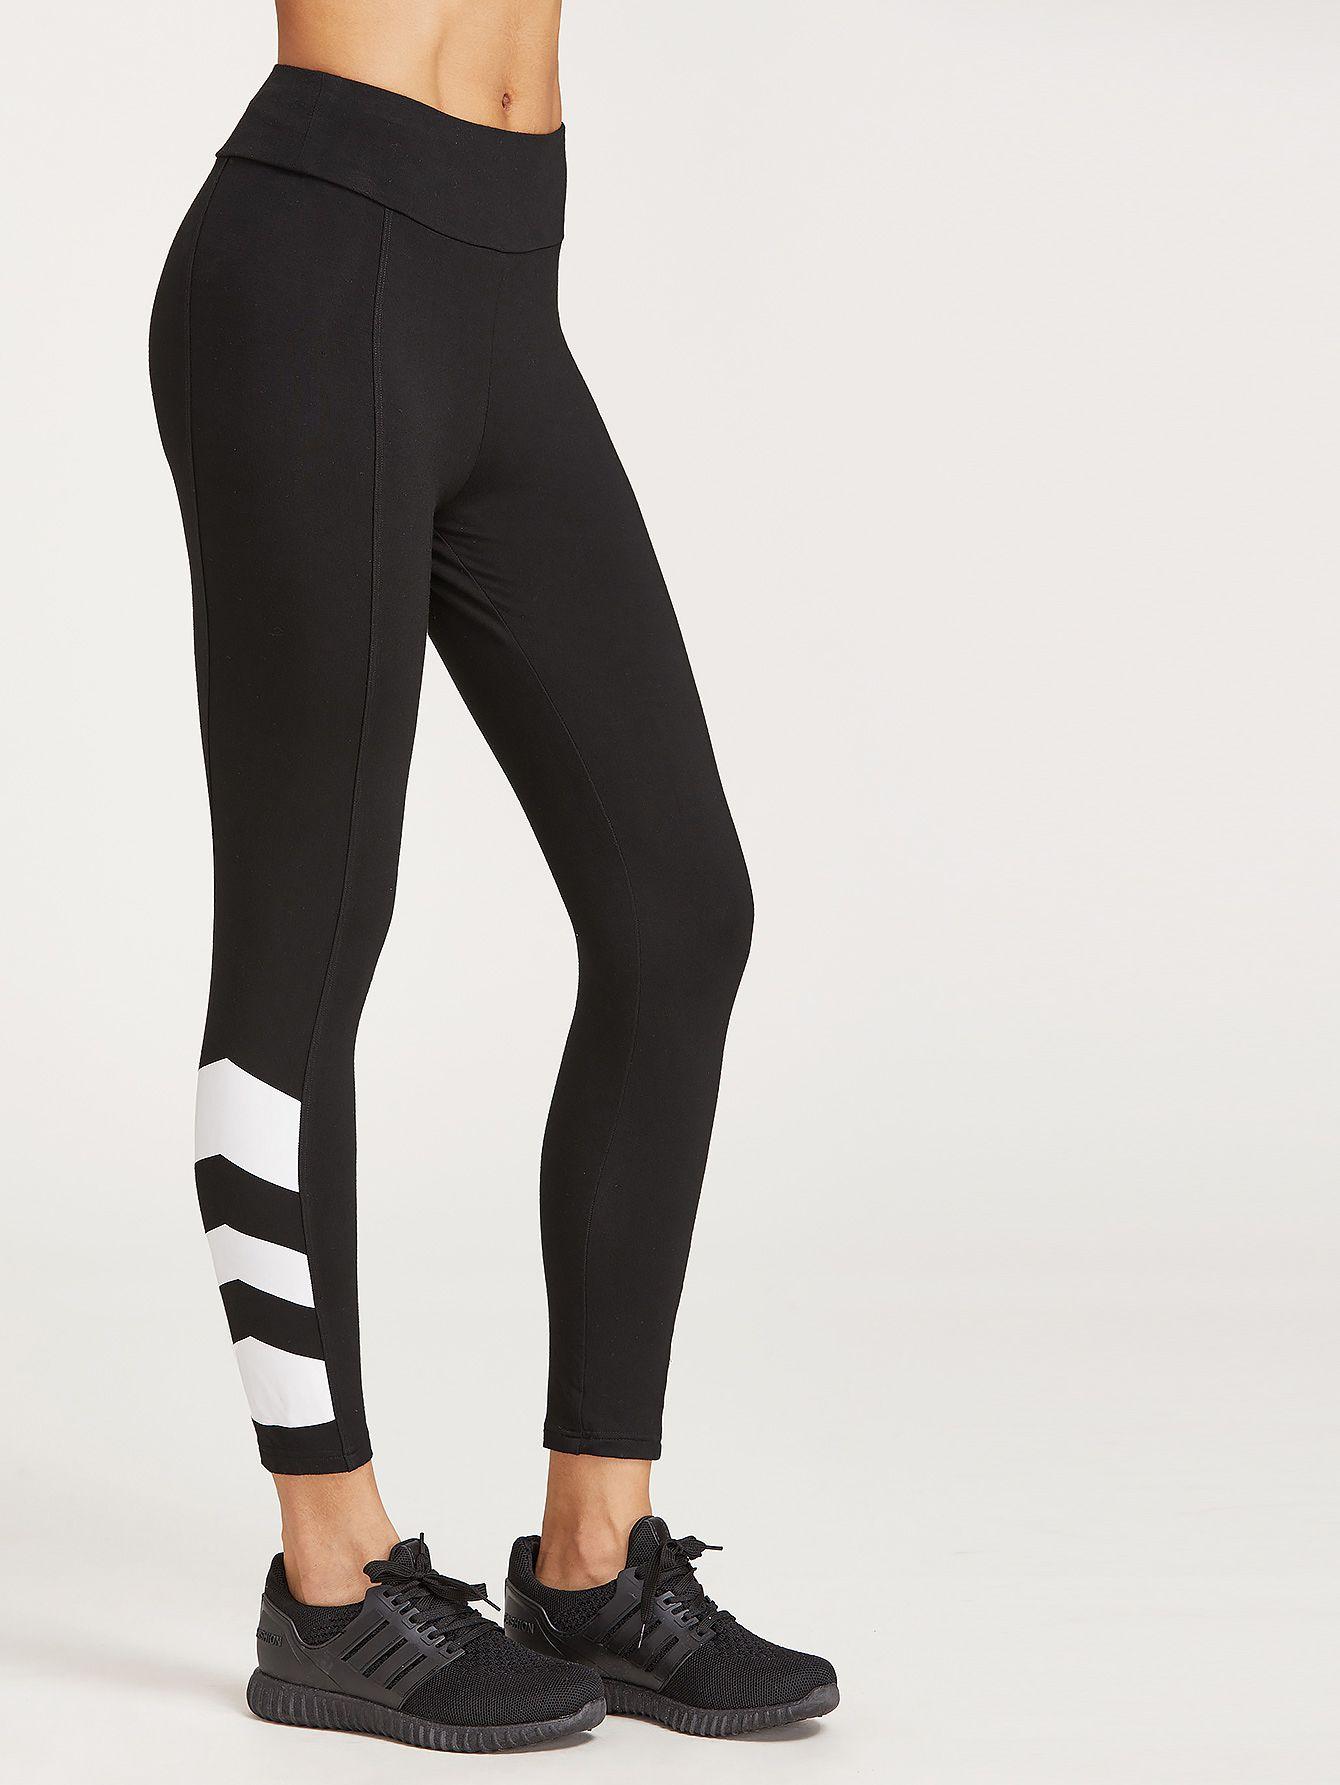 e007fdcc64f9ac Shop Black Contrast Print Hem Crop Leggings online. SheIn offers Black  Contrast Print Hem Crop Leggings & more to fit your fashionable needs.